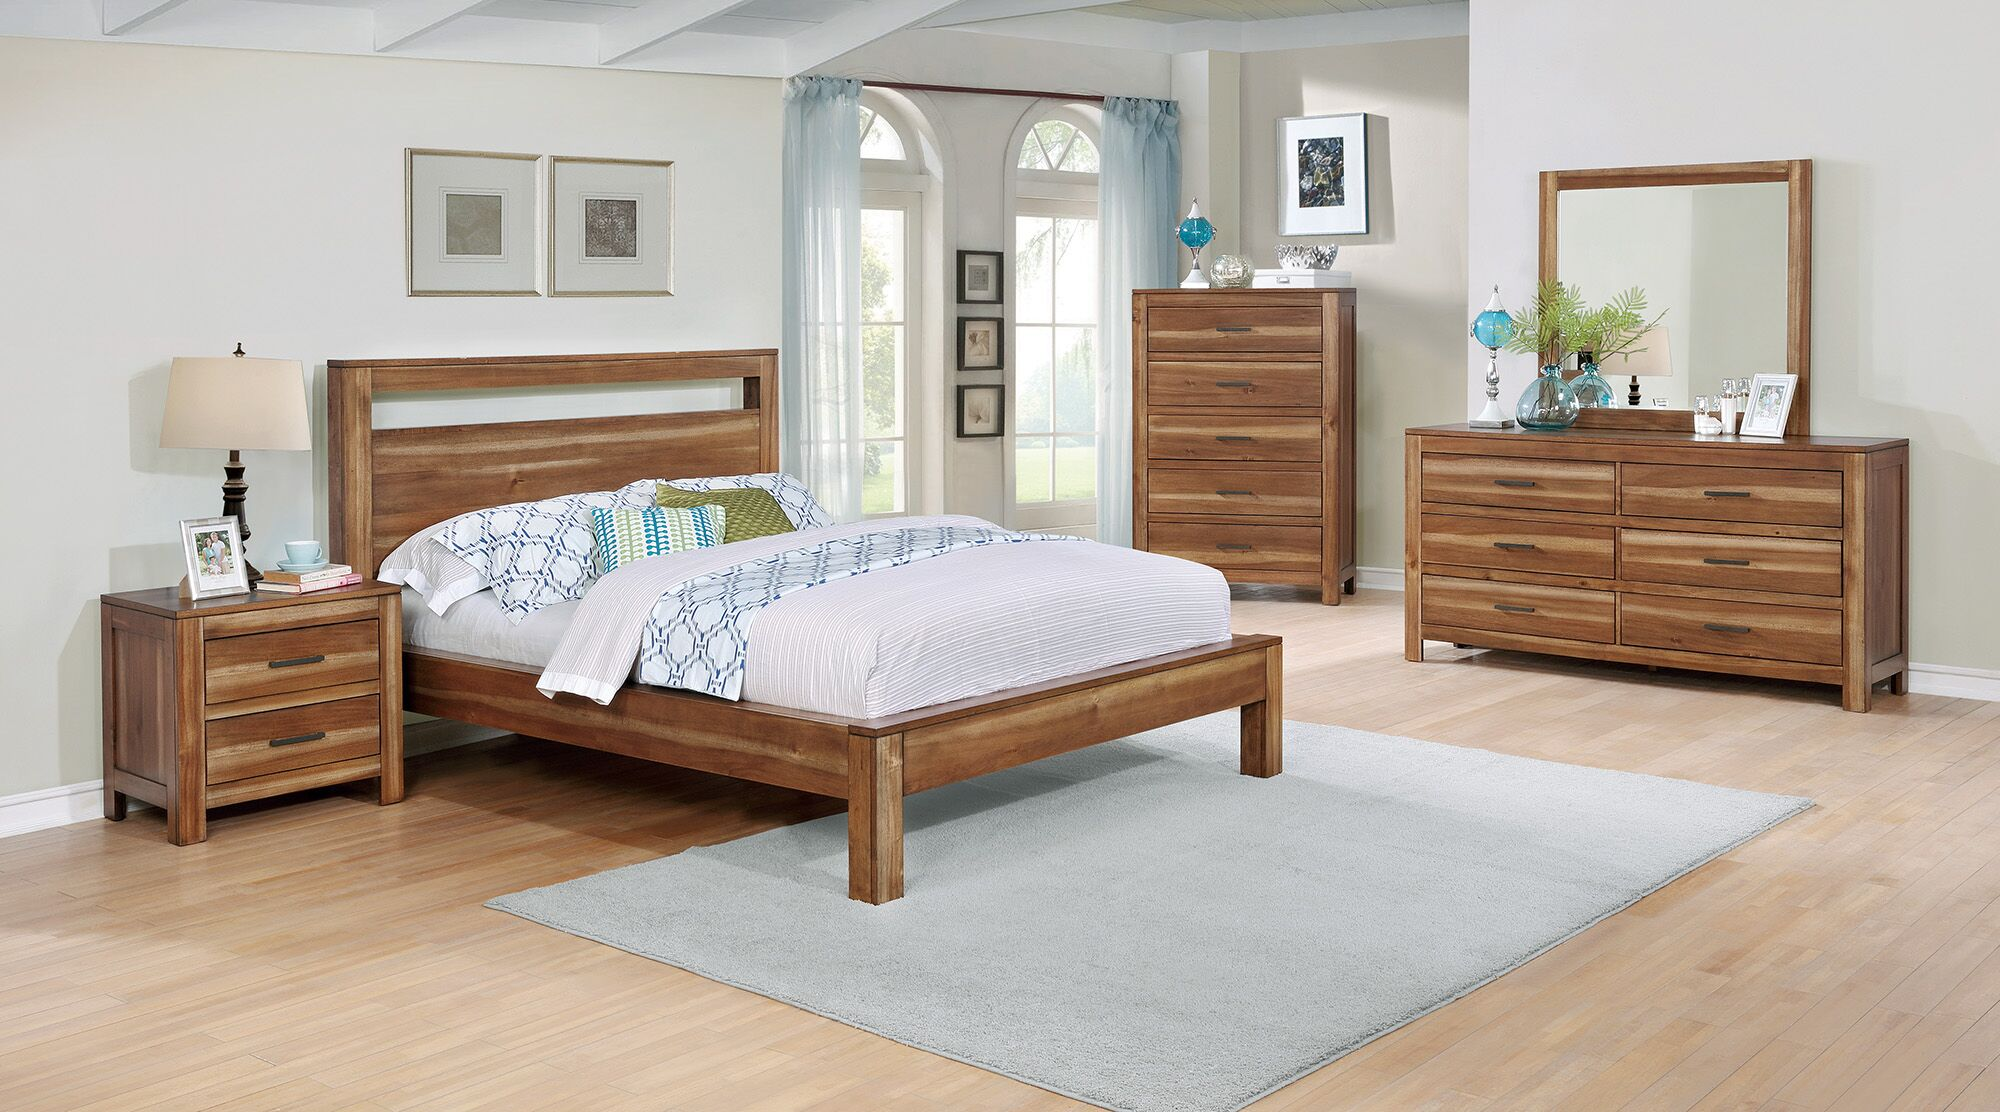 Point Arena Platform Bed Size: California King